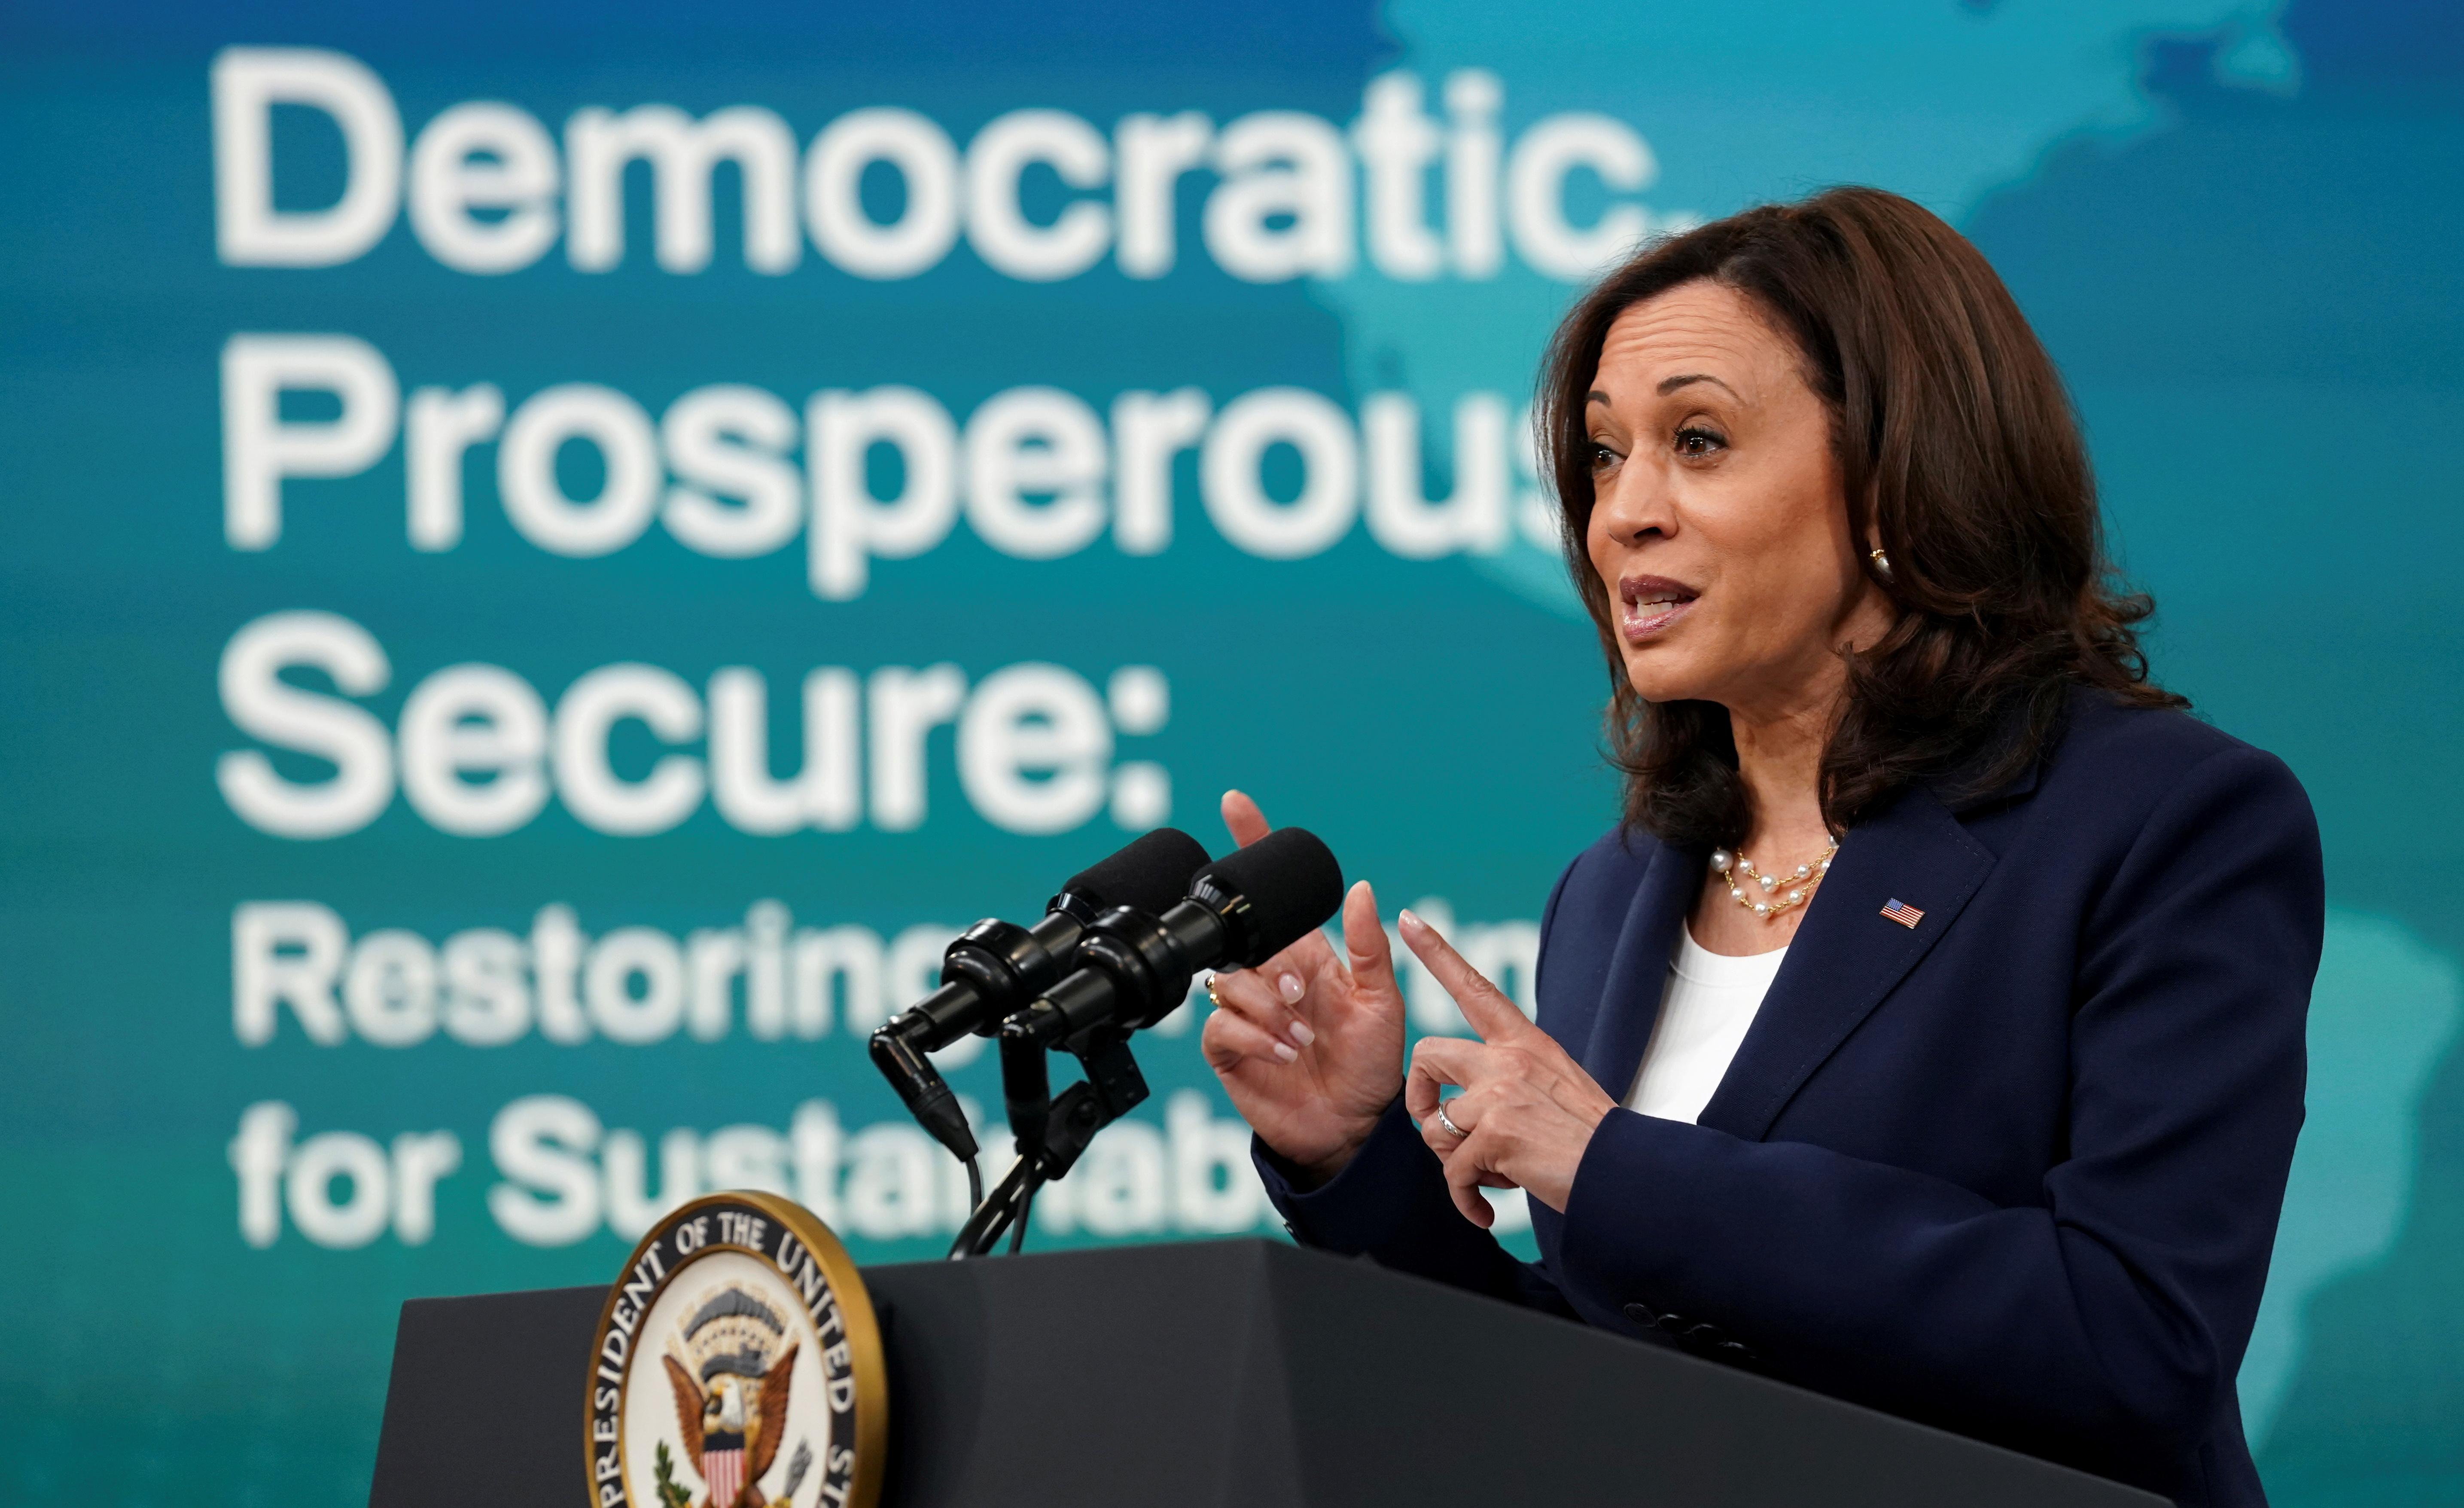 U.S. Vice President Kamala Harris speaks at the virtual Washington Conference on the Americas in Washington, U.S., May 4, 2021. REUTERS/Kevin Lamarque/File Photo